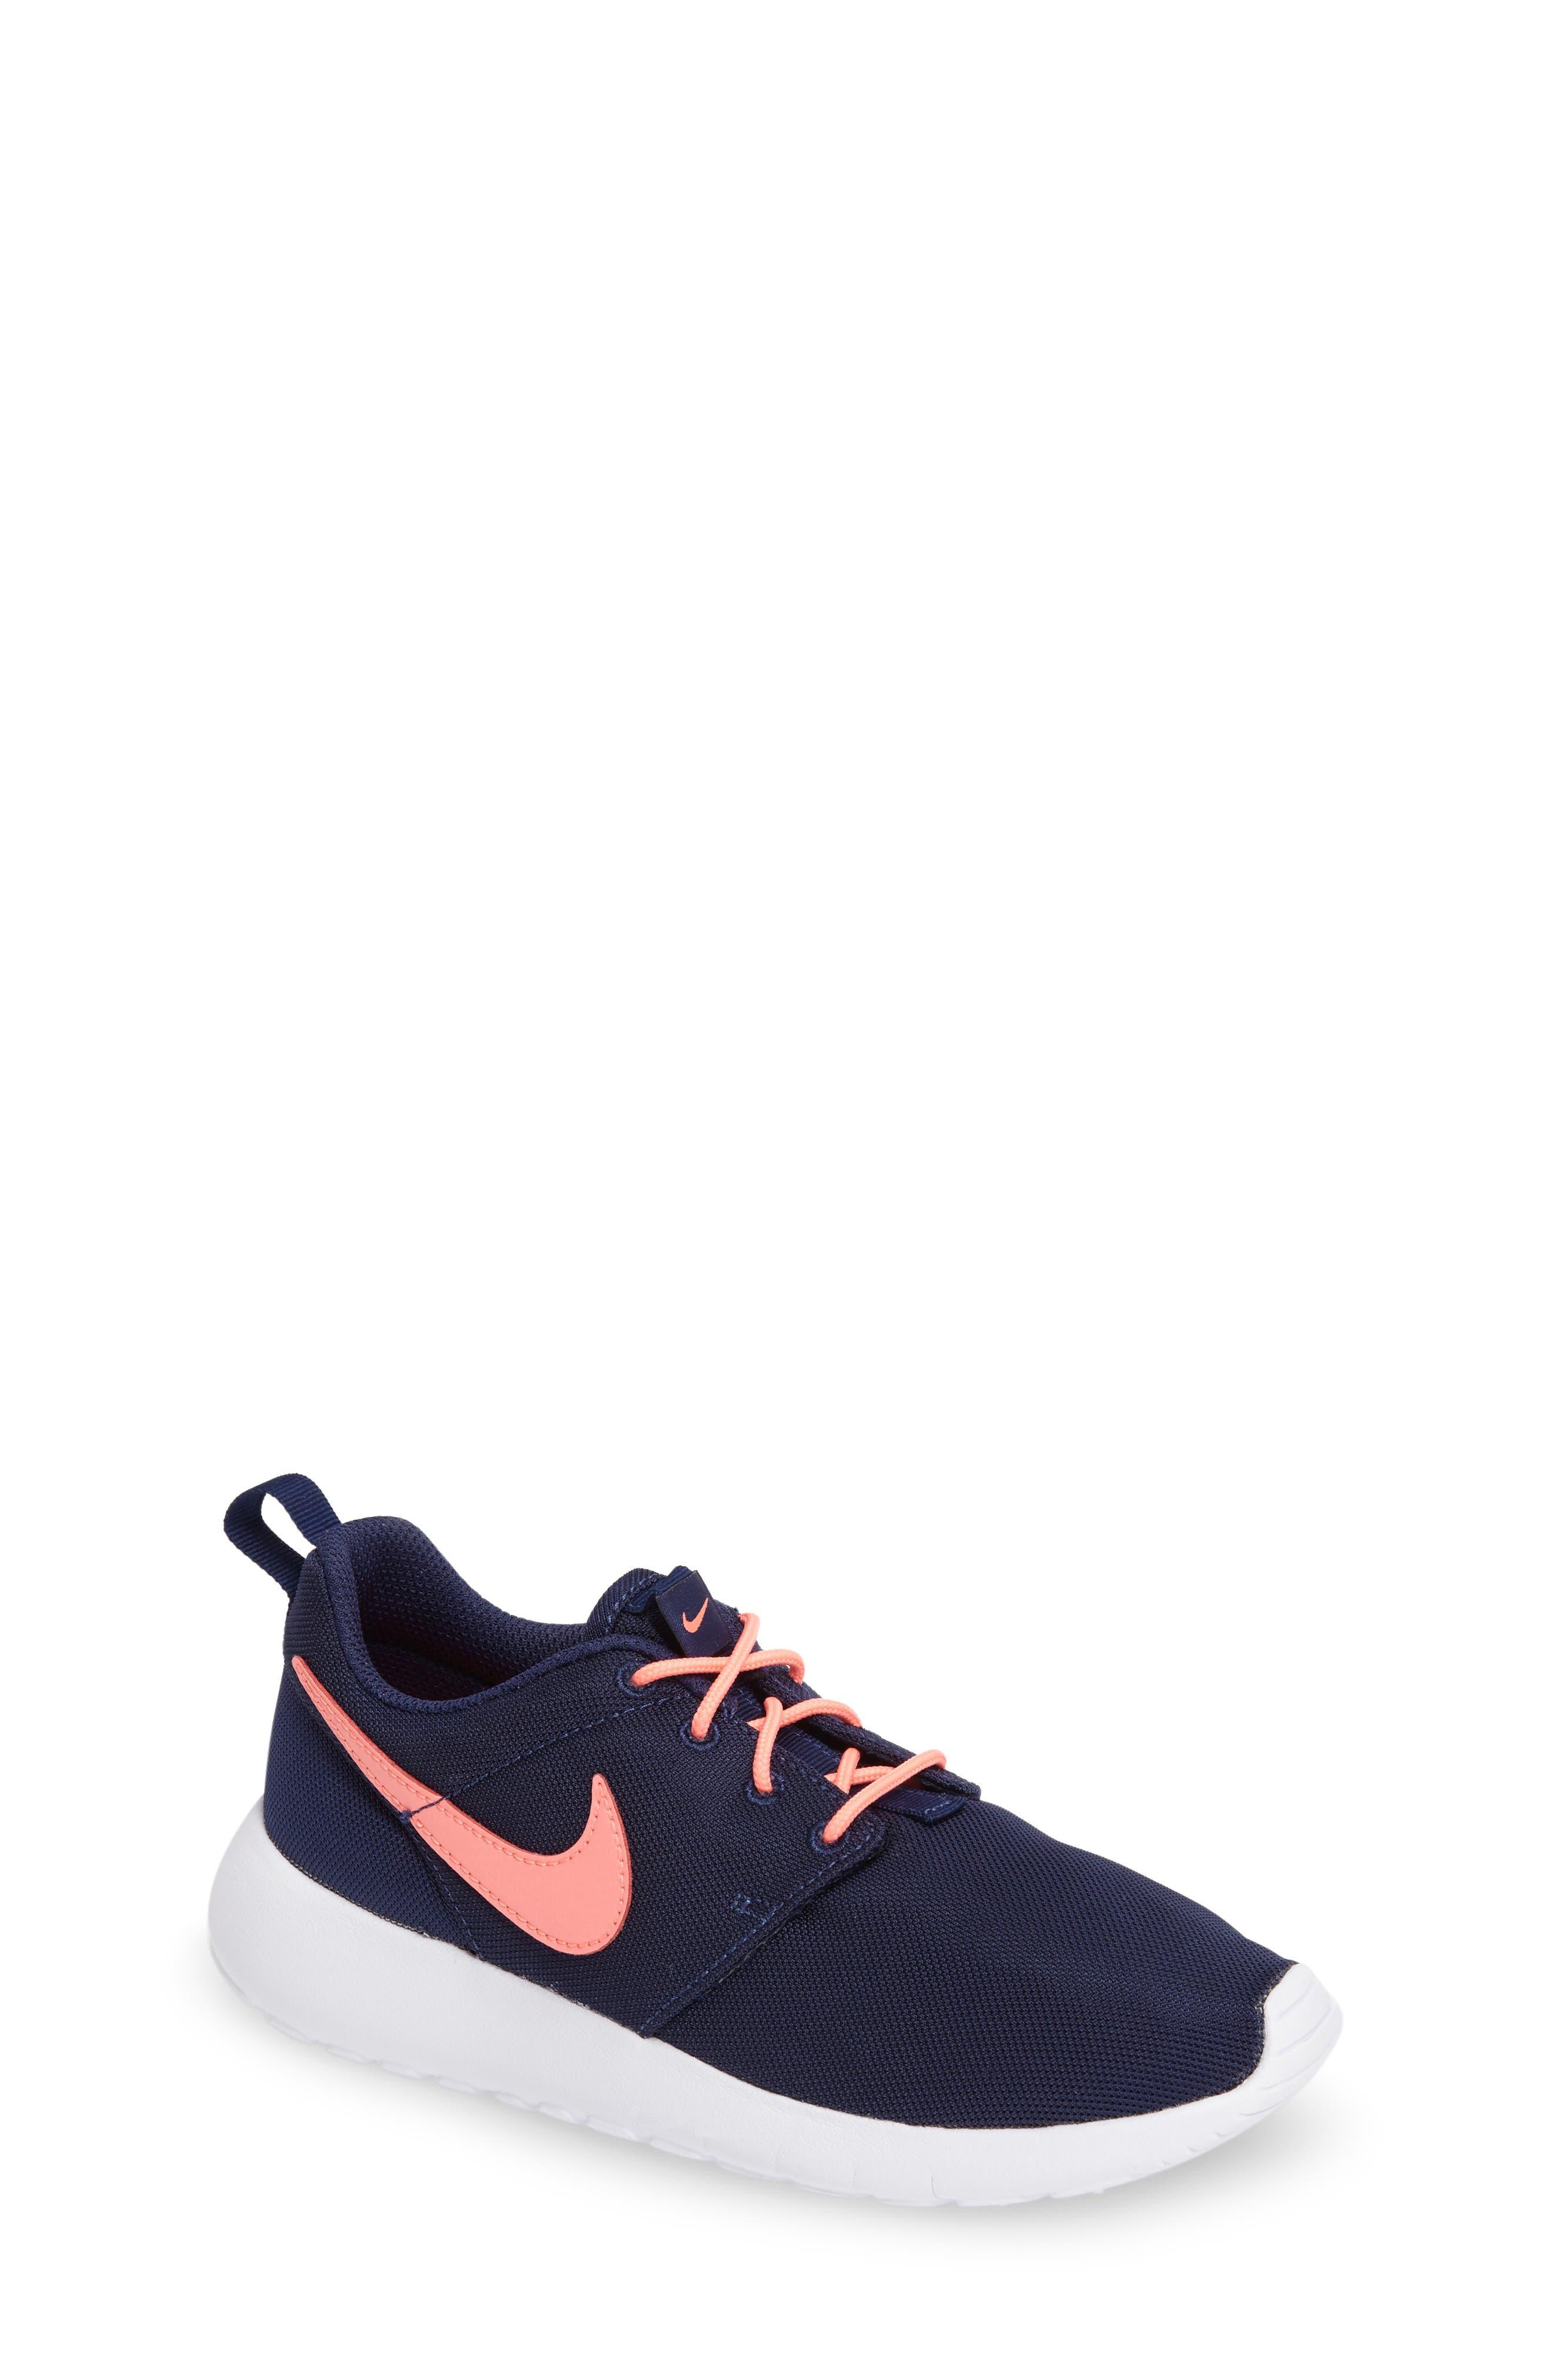 'Roshe Run' Athletic Shoe,                             Main thumbnail 37, color,